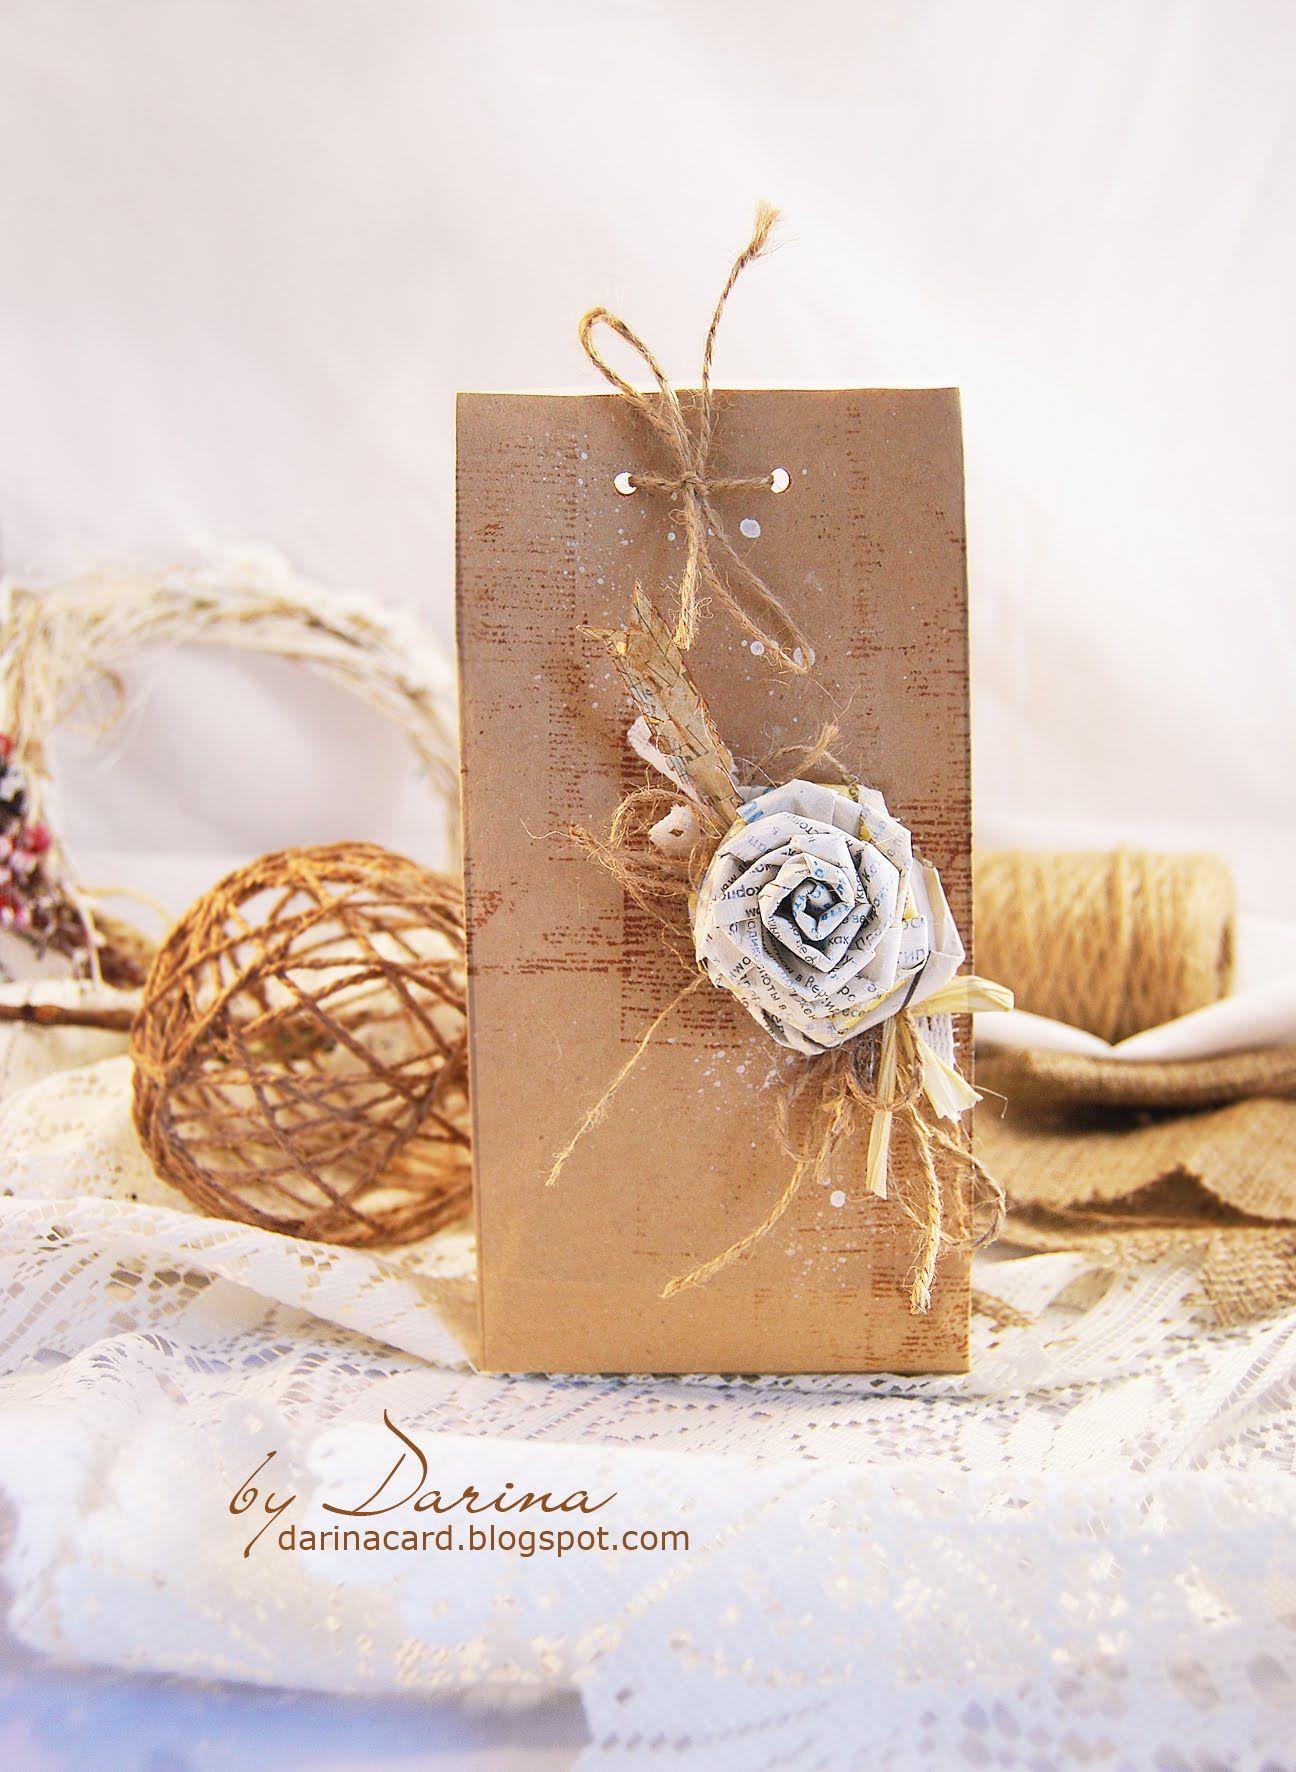 Креативная упаковка подарков своими руками фото 146